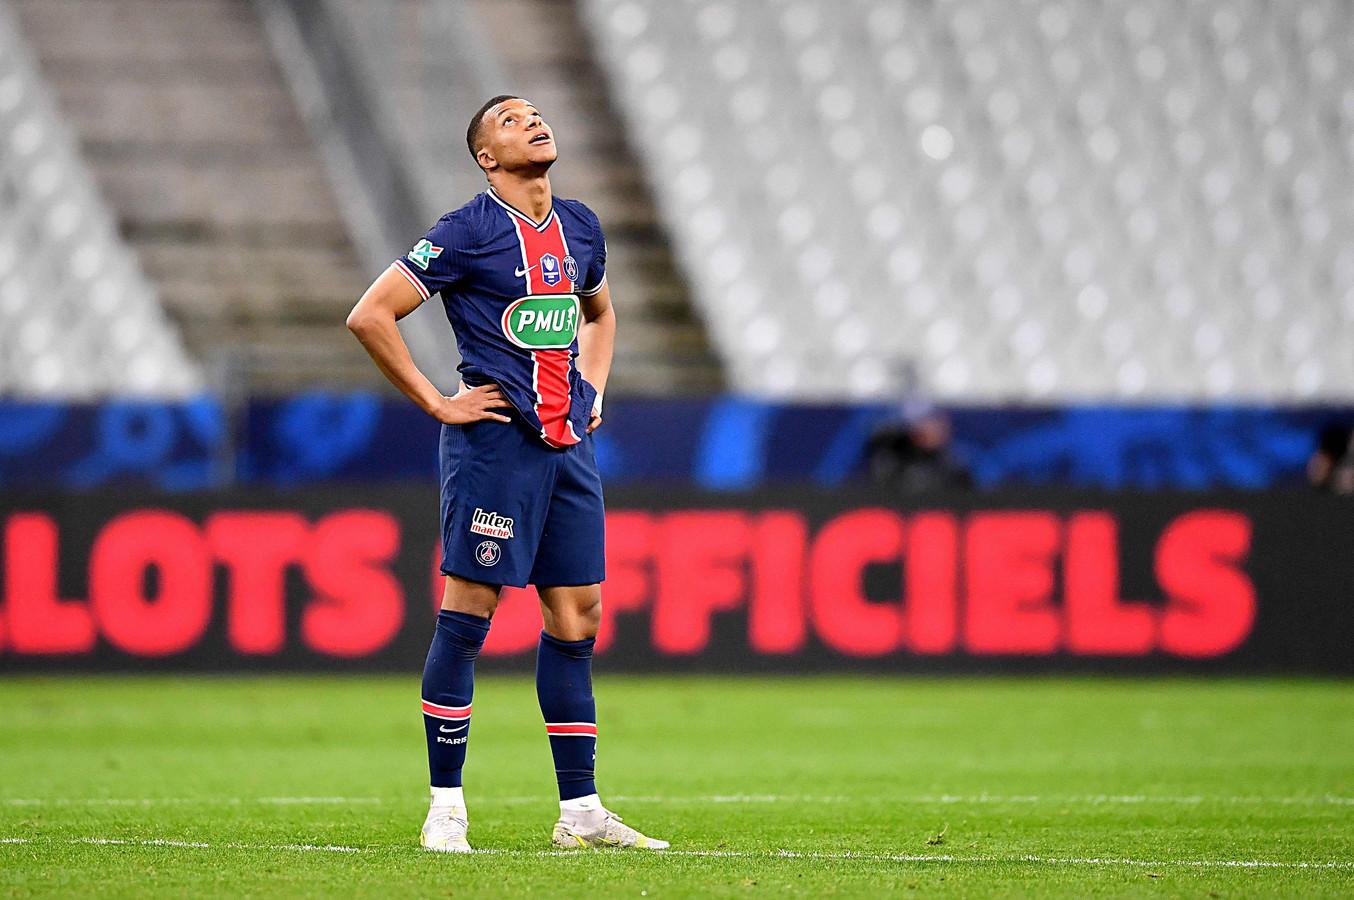 Waar voetbalt Mbappé op 1 september?